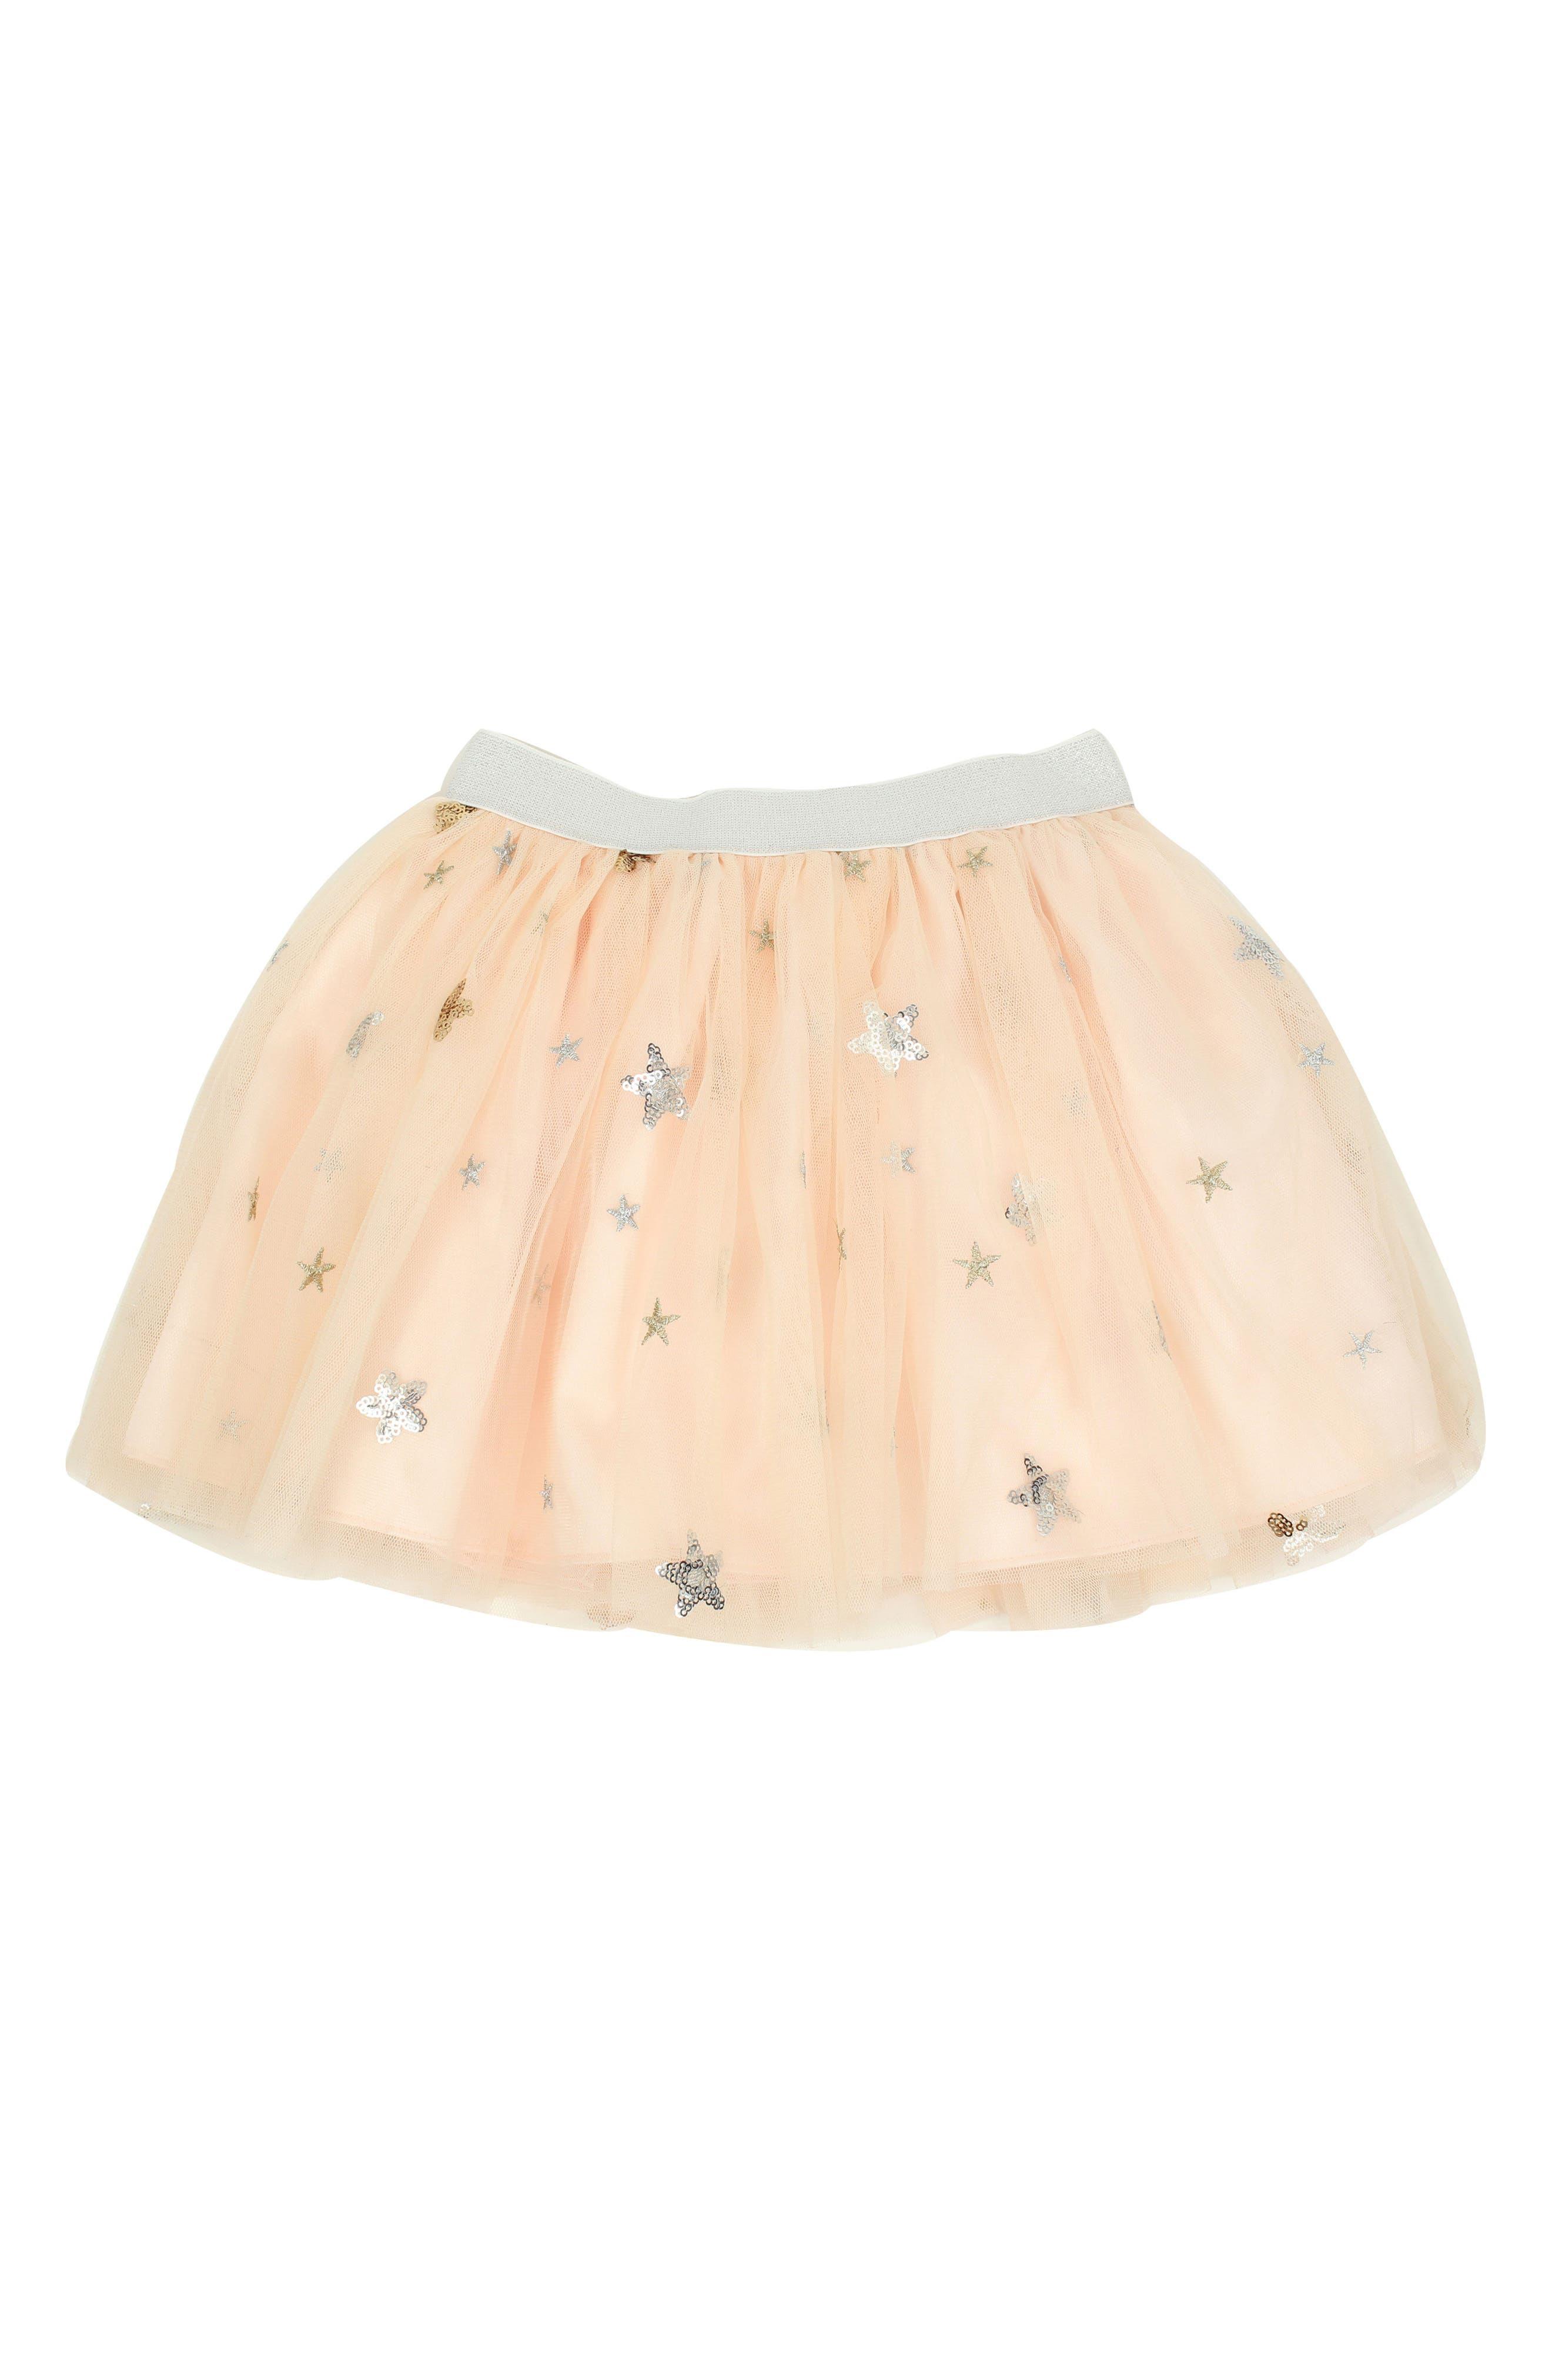 POPATU Metallic Stars Tulle Skirt, Main, color, PEACH